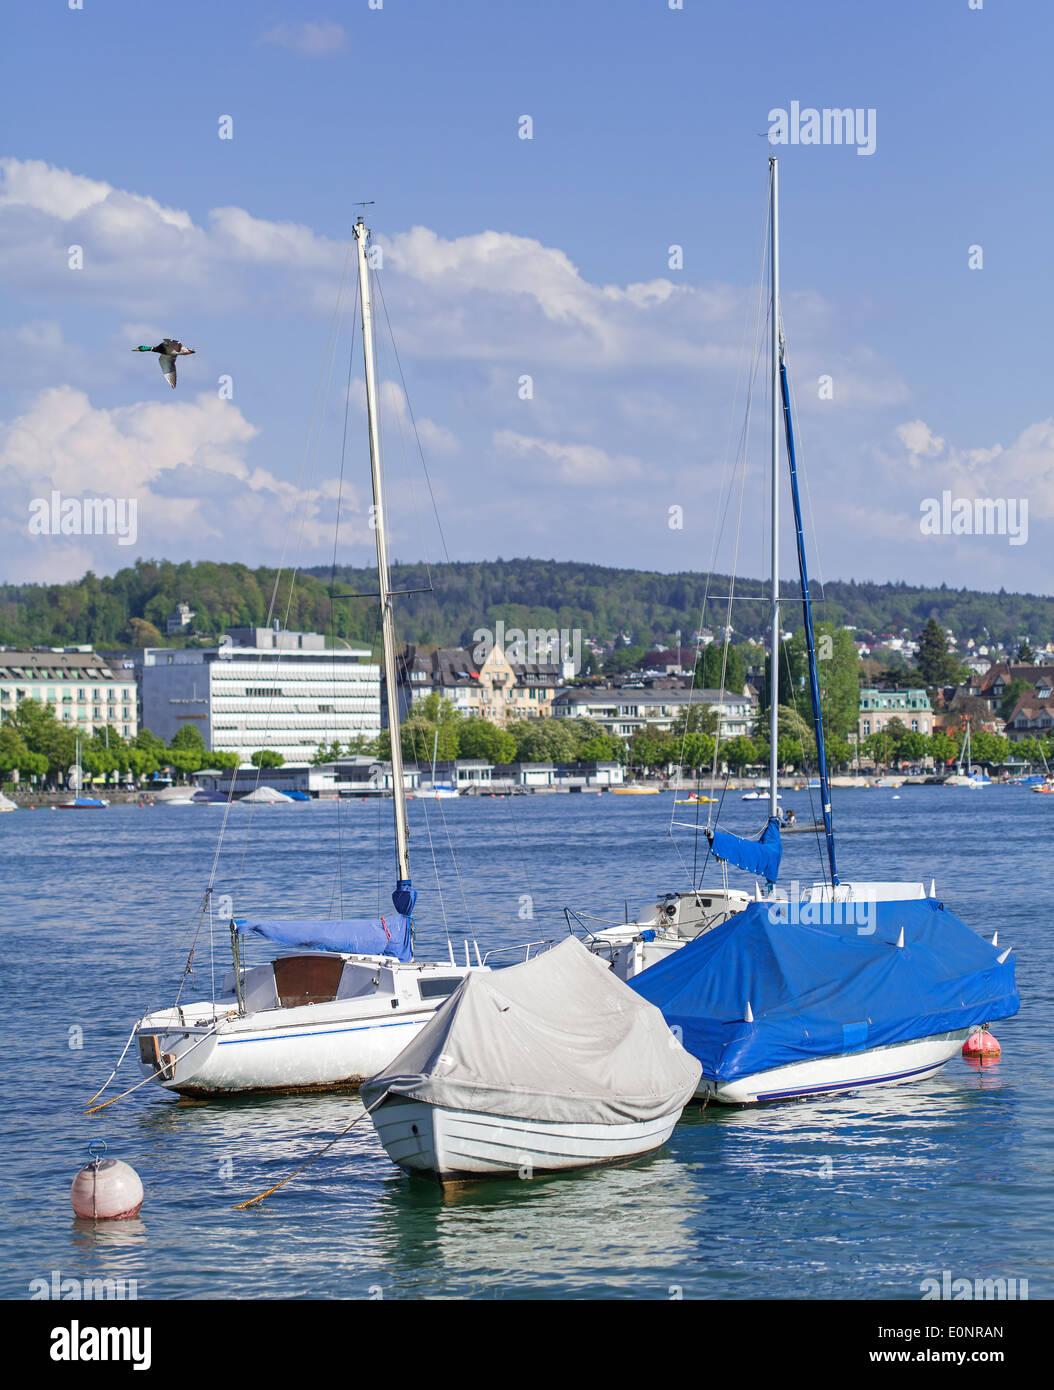 Lake Zurich in spring - Stock Image